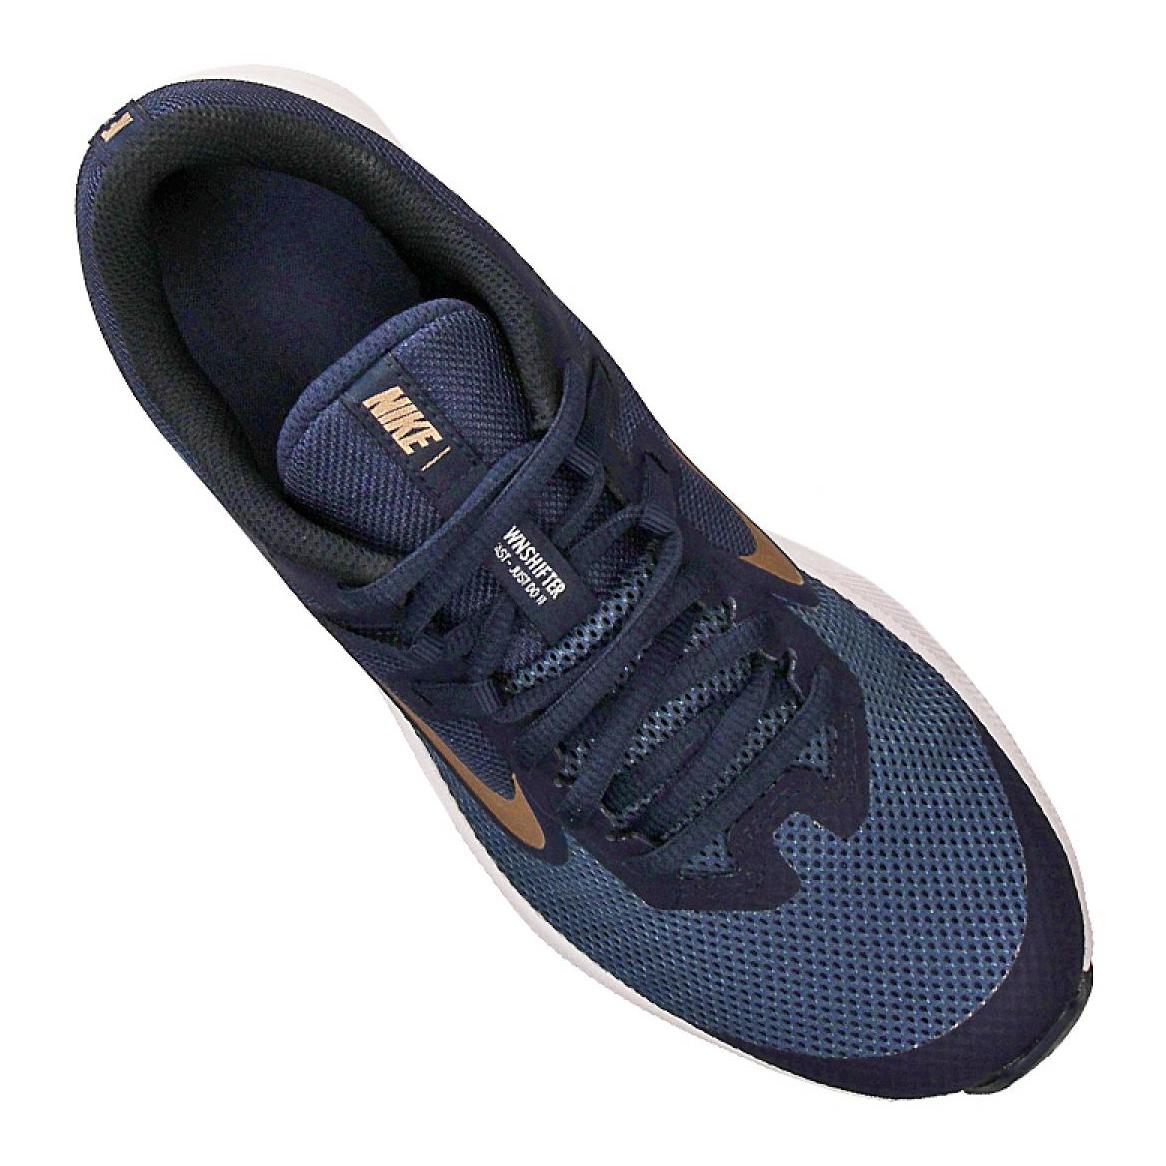 Nike Nightgazer M 644402 412 cipő haditengerészet ButyModne.pl